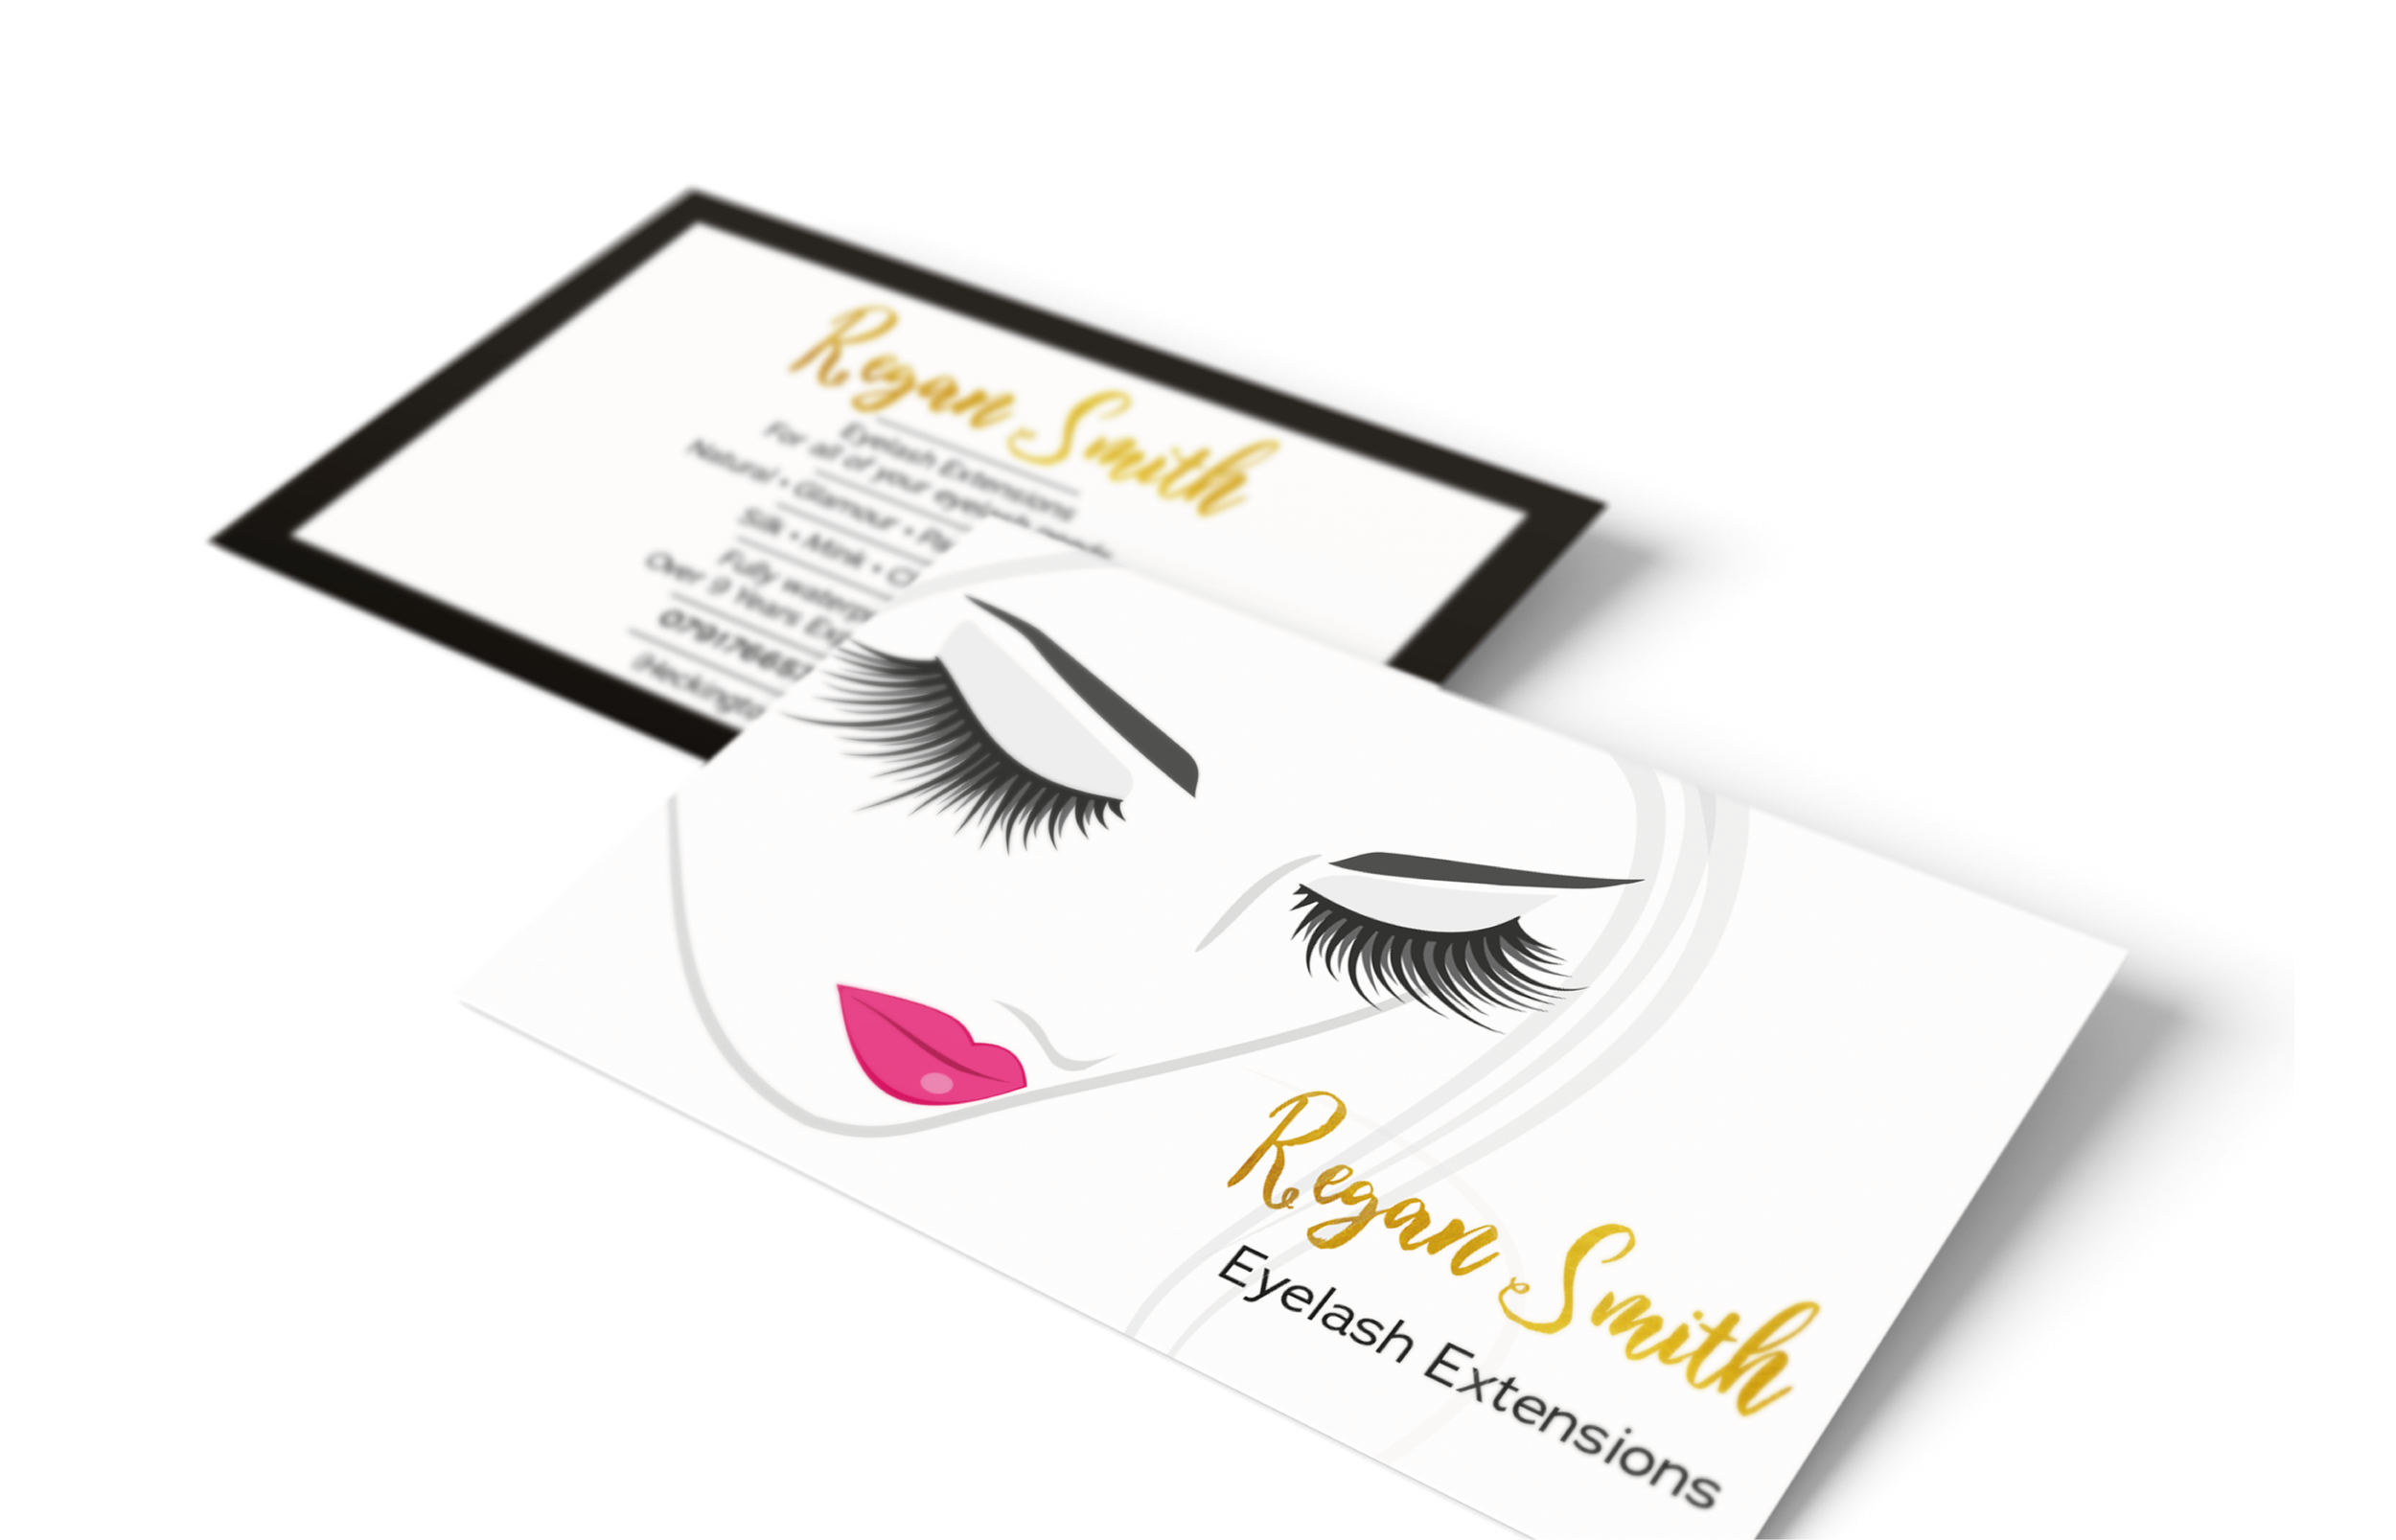 Eyelash Extensions Business Card Design and Print Nottingham